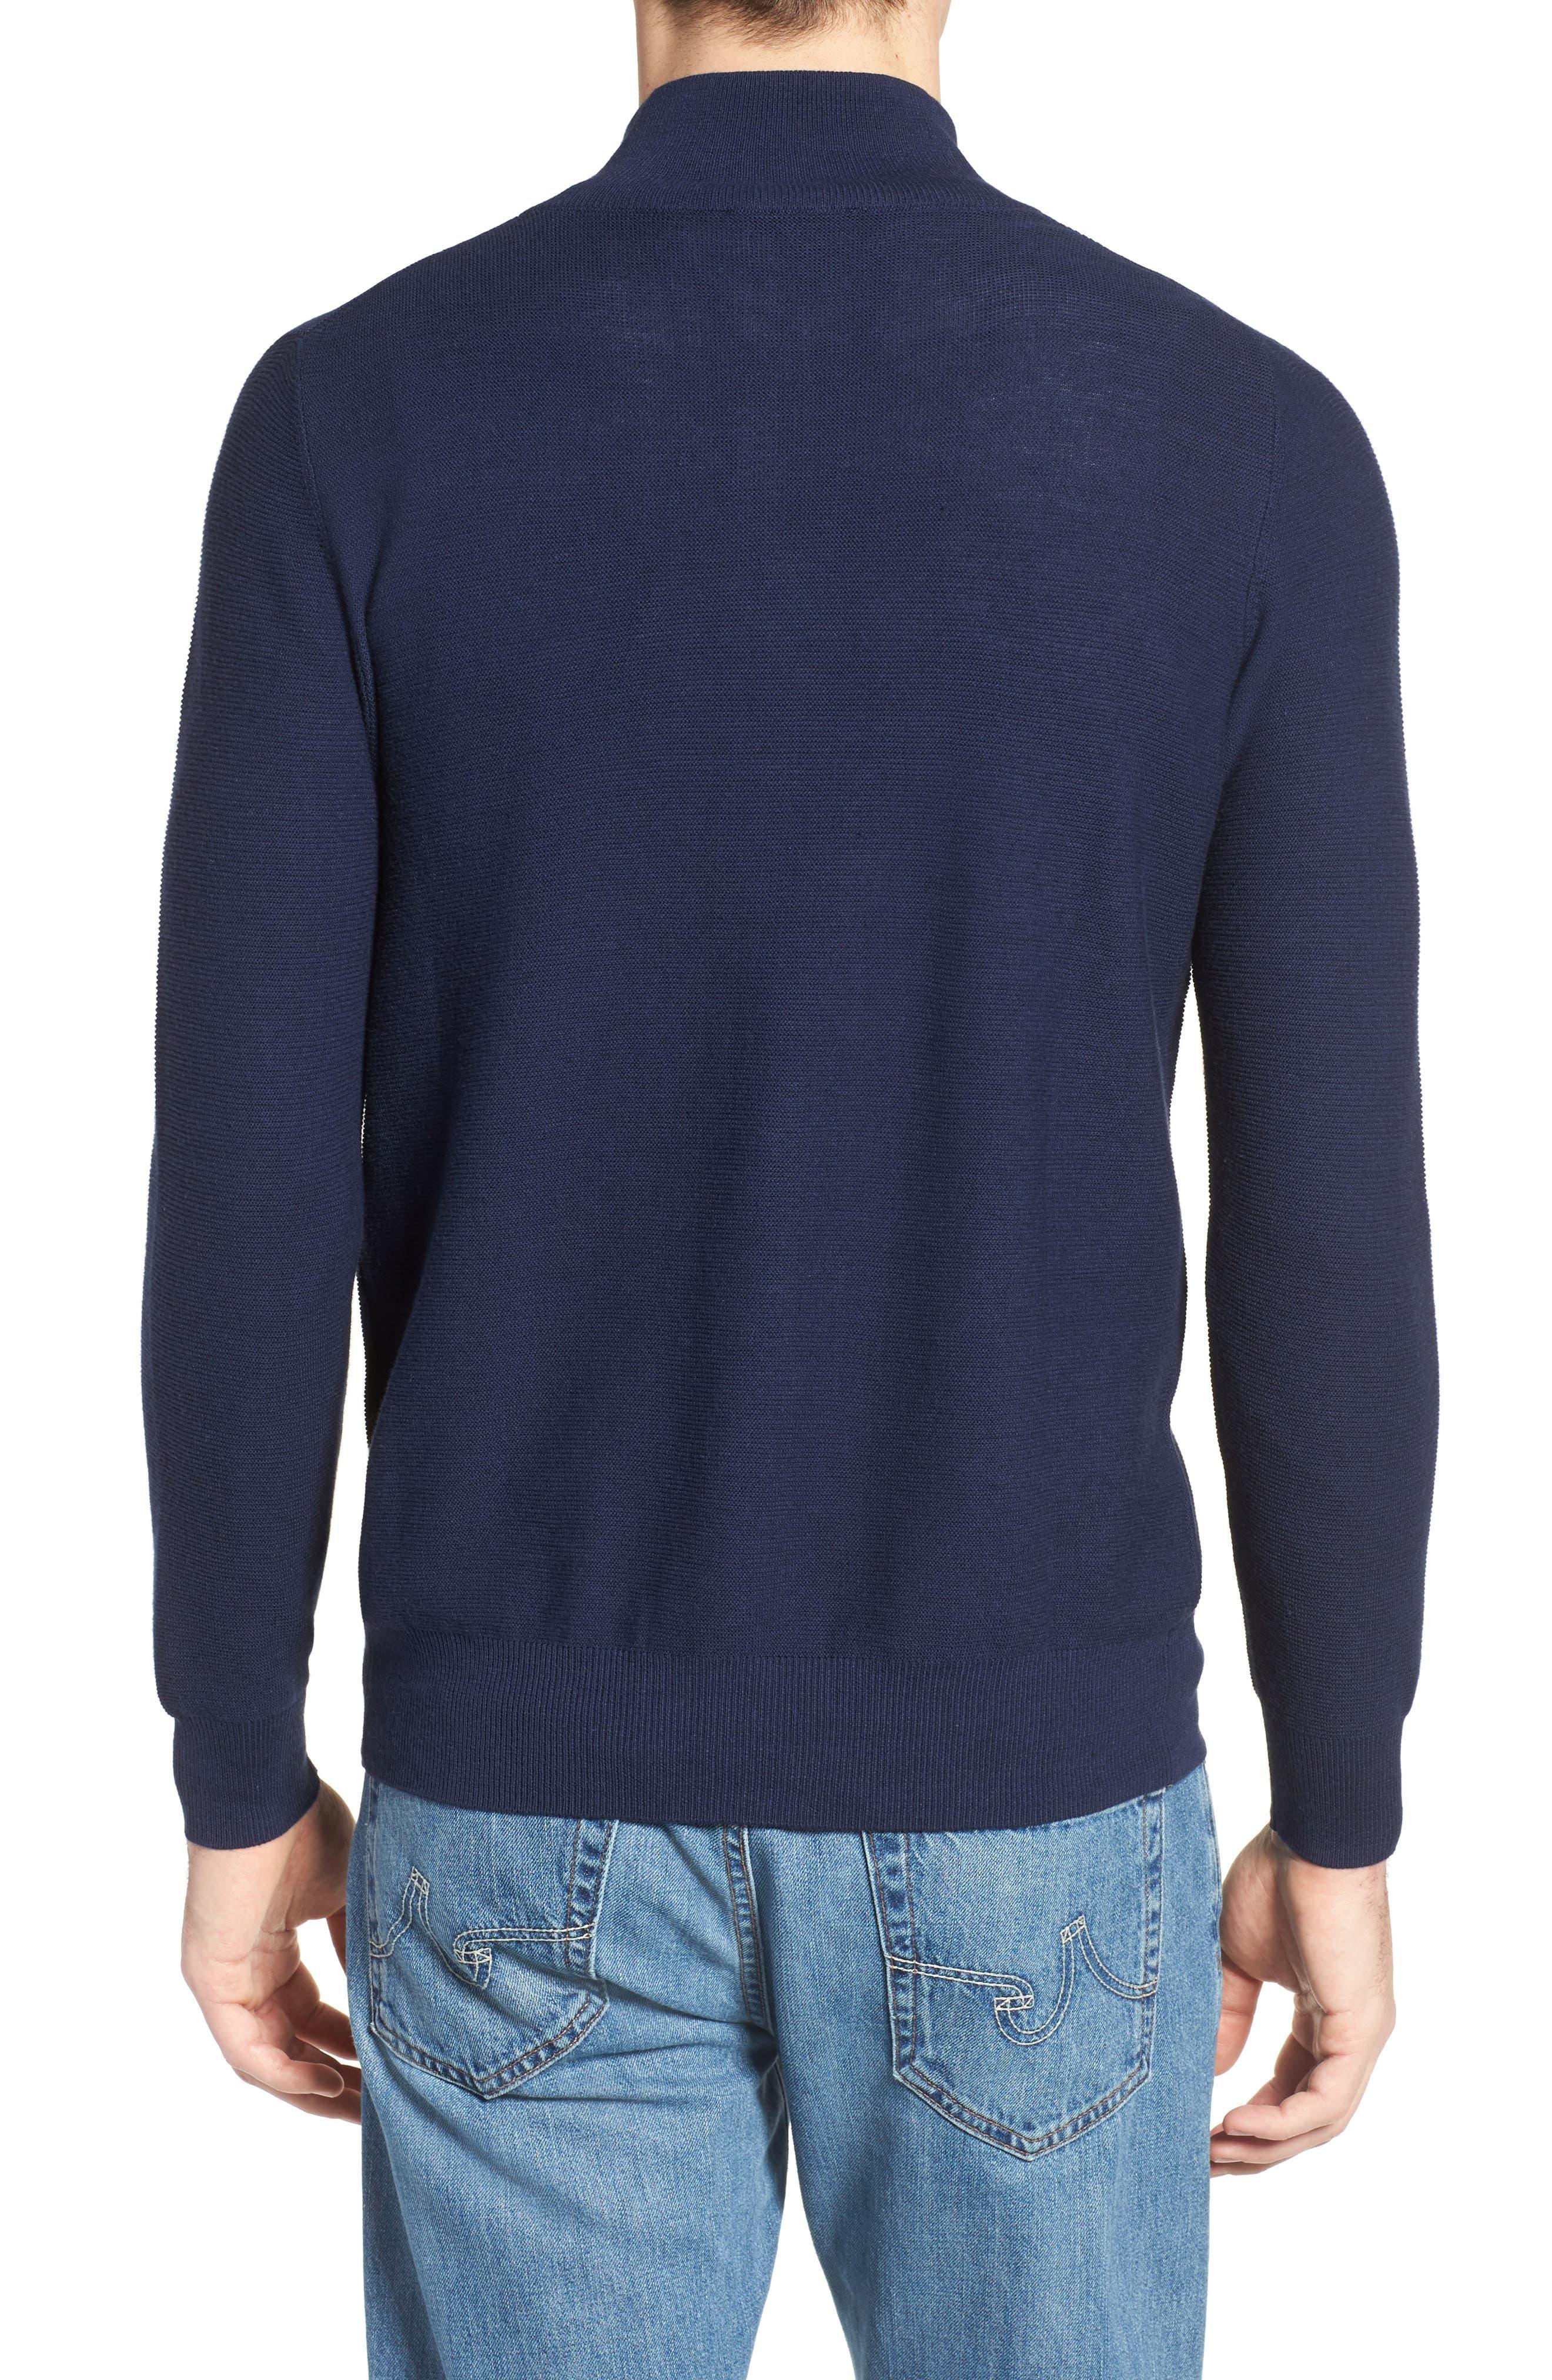 Quarter Zip Sweater,                             Alternate thumbnail 2, color,                             Navy